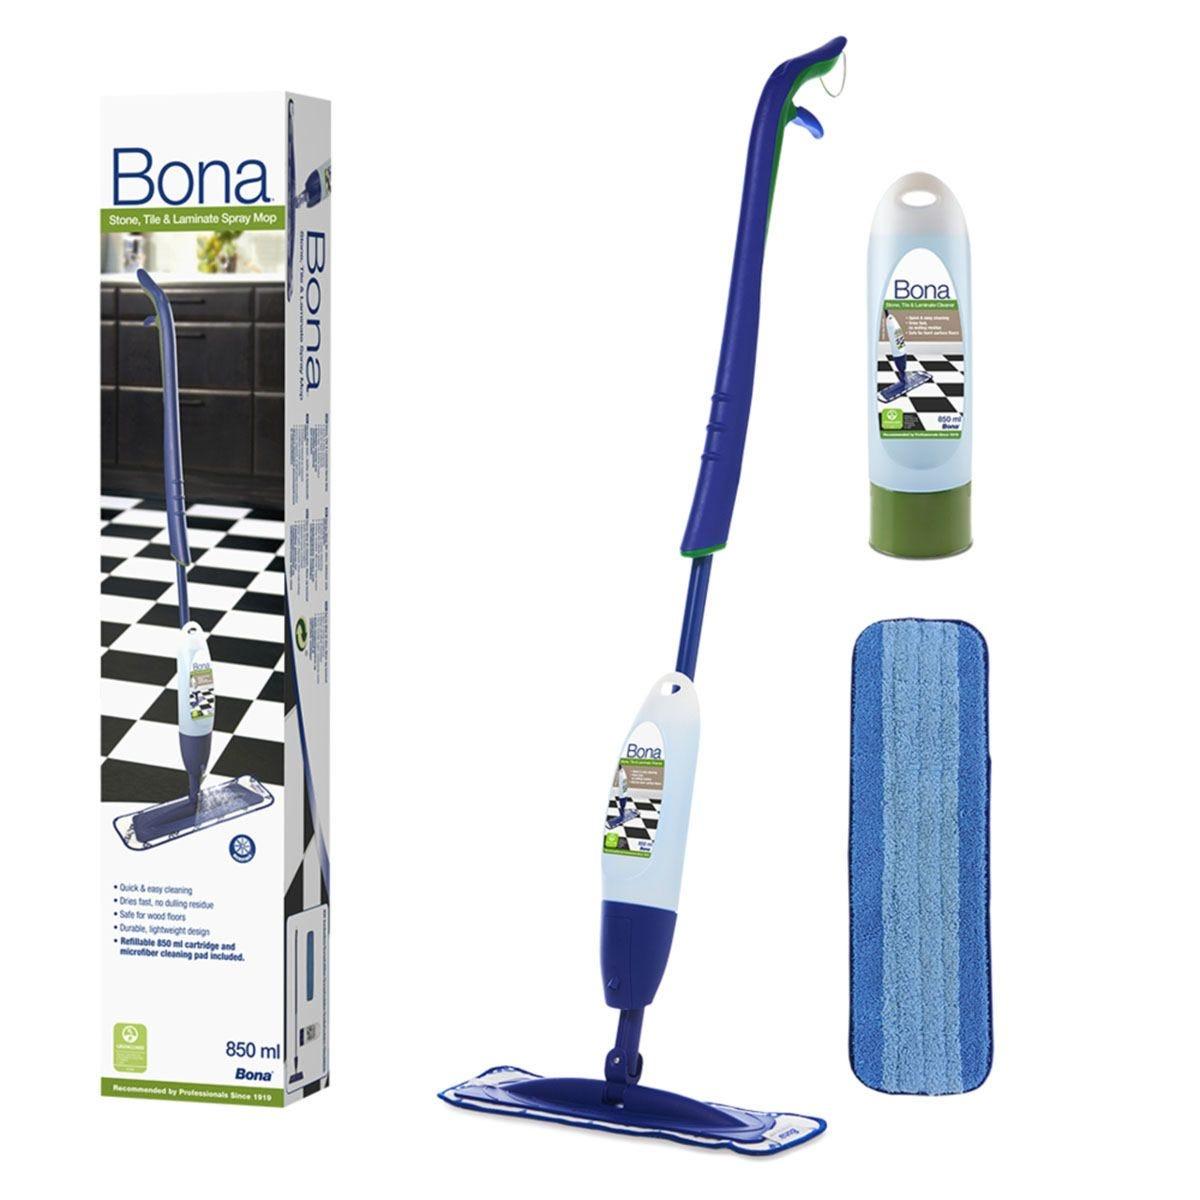 Bona Stone, Tile and Laminate Spray Mop Kit